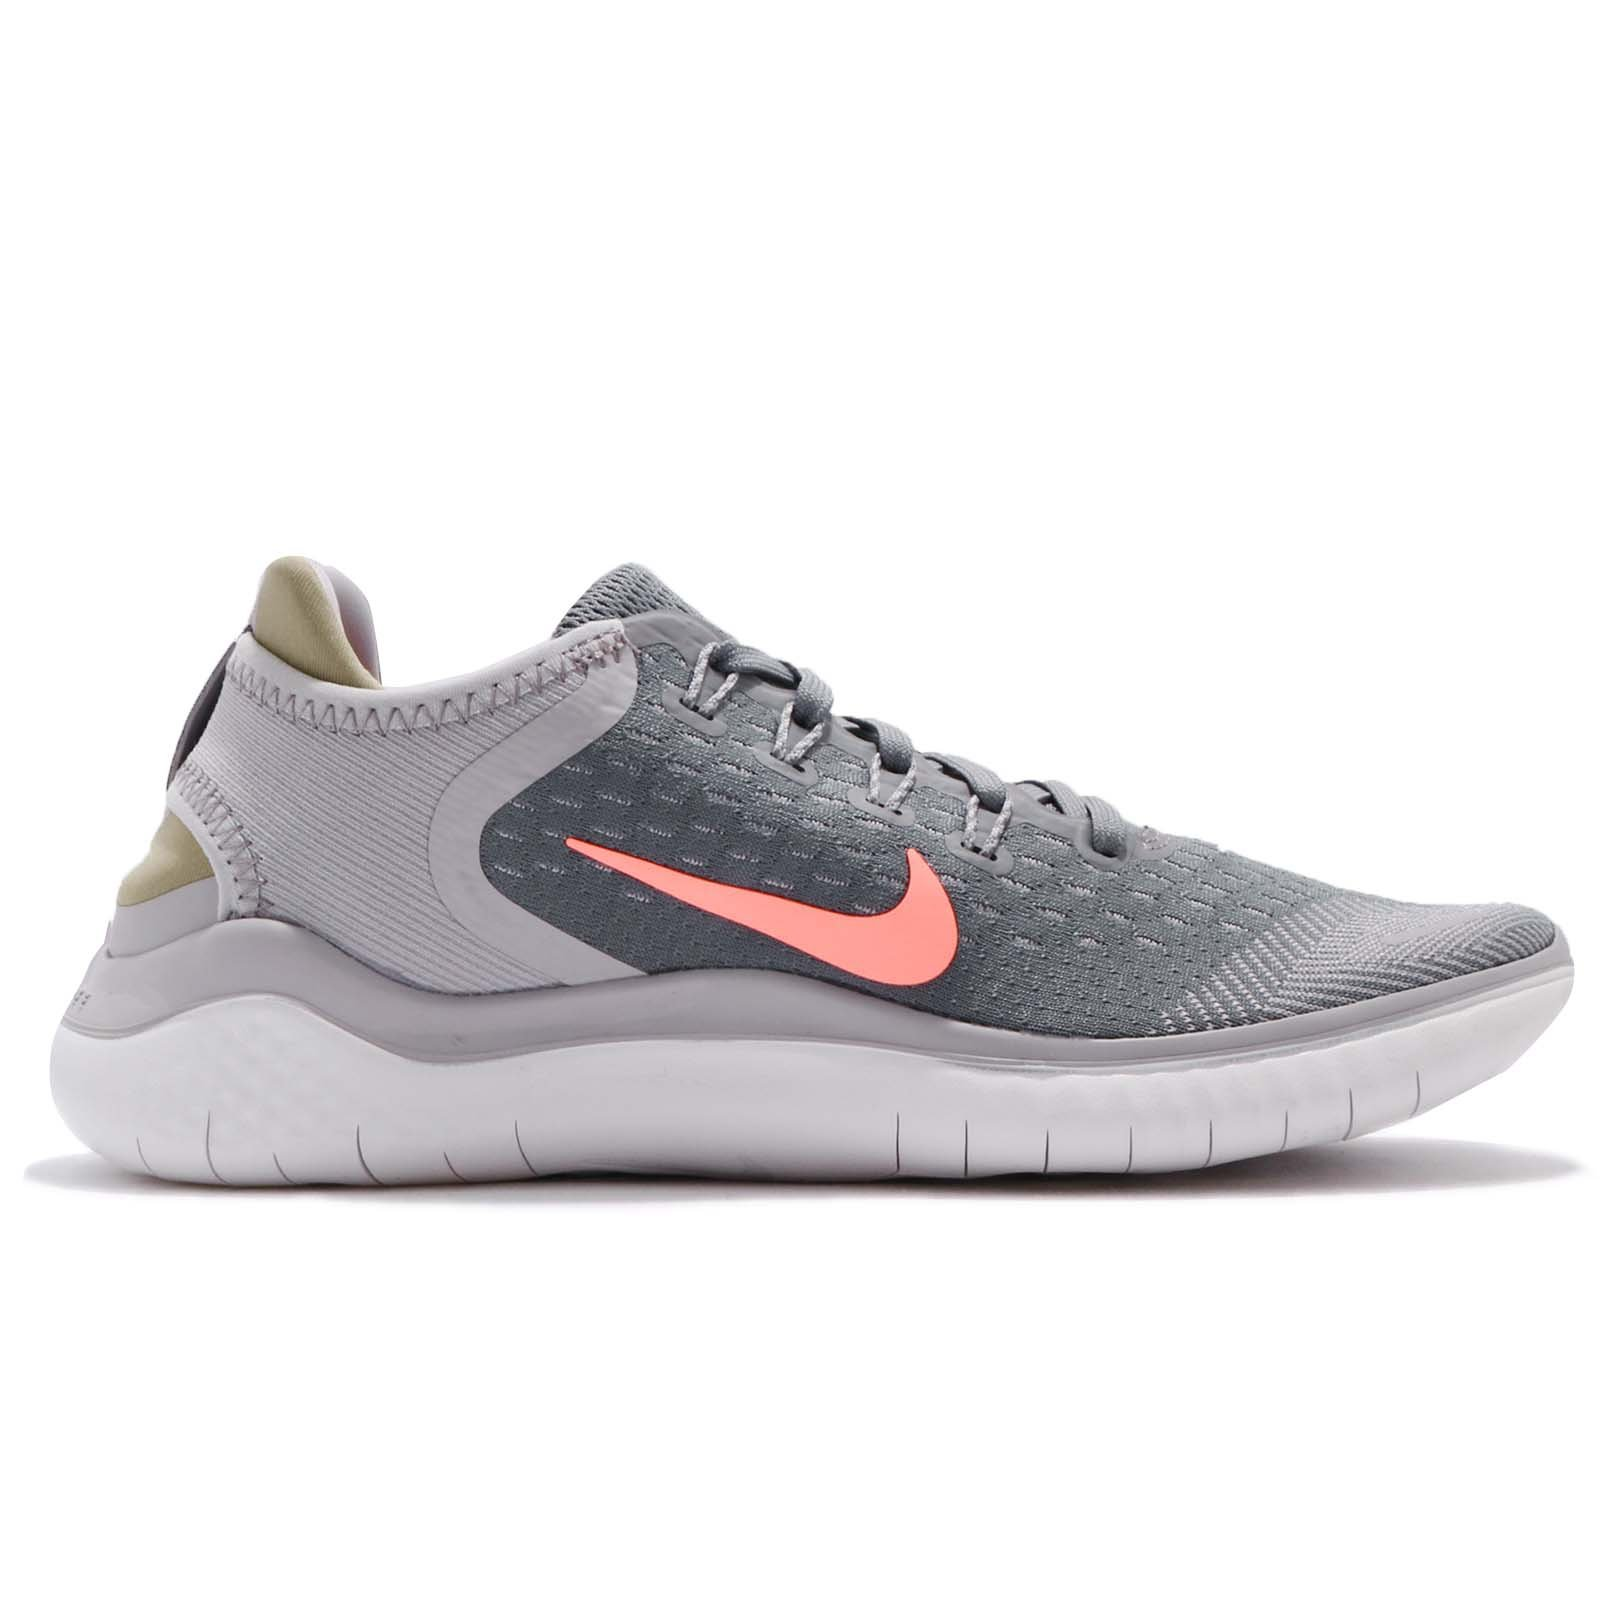 Nike Damen Laufschuh Free Run 2018 B07BZZC18C B07BZZC18C